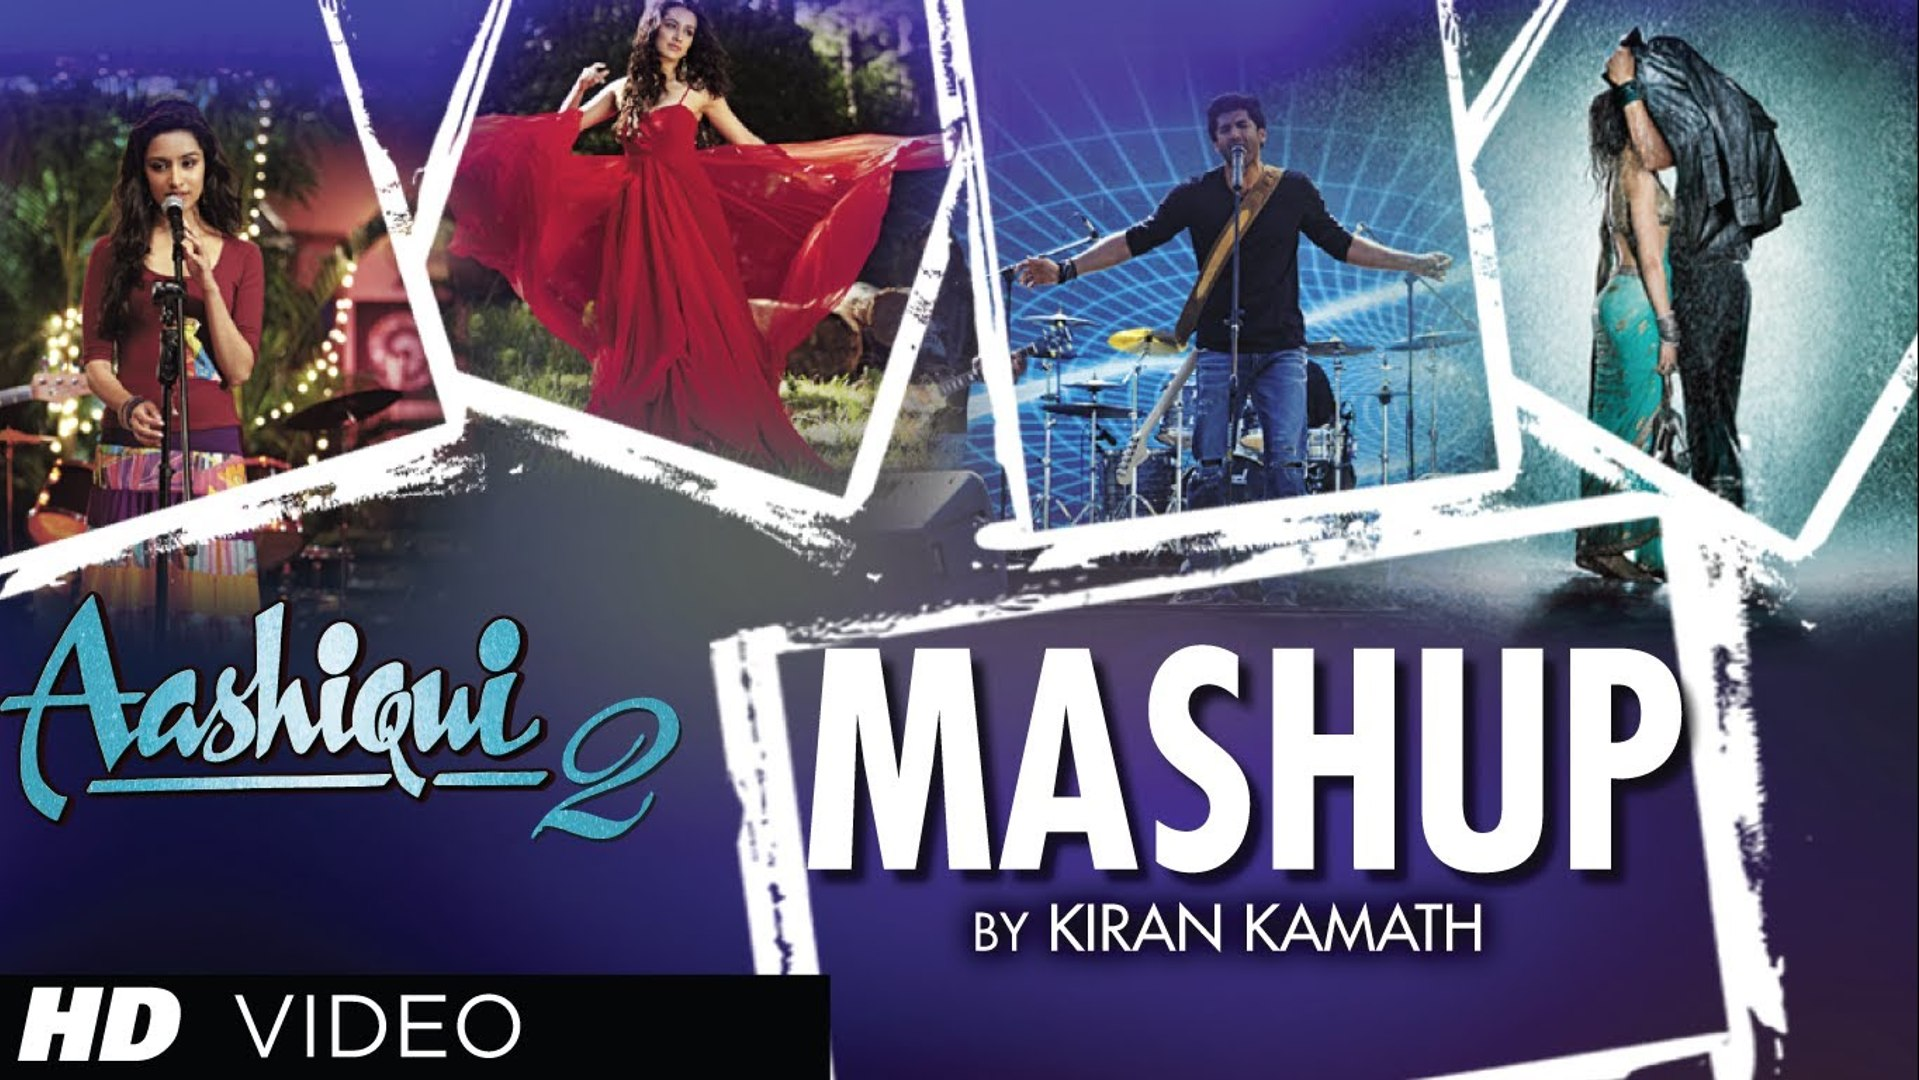 Aashiqui- 2 All Song Mashup - 1080p Full Songs